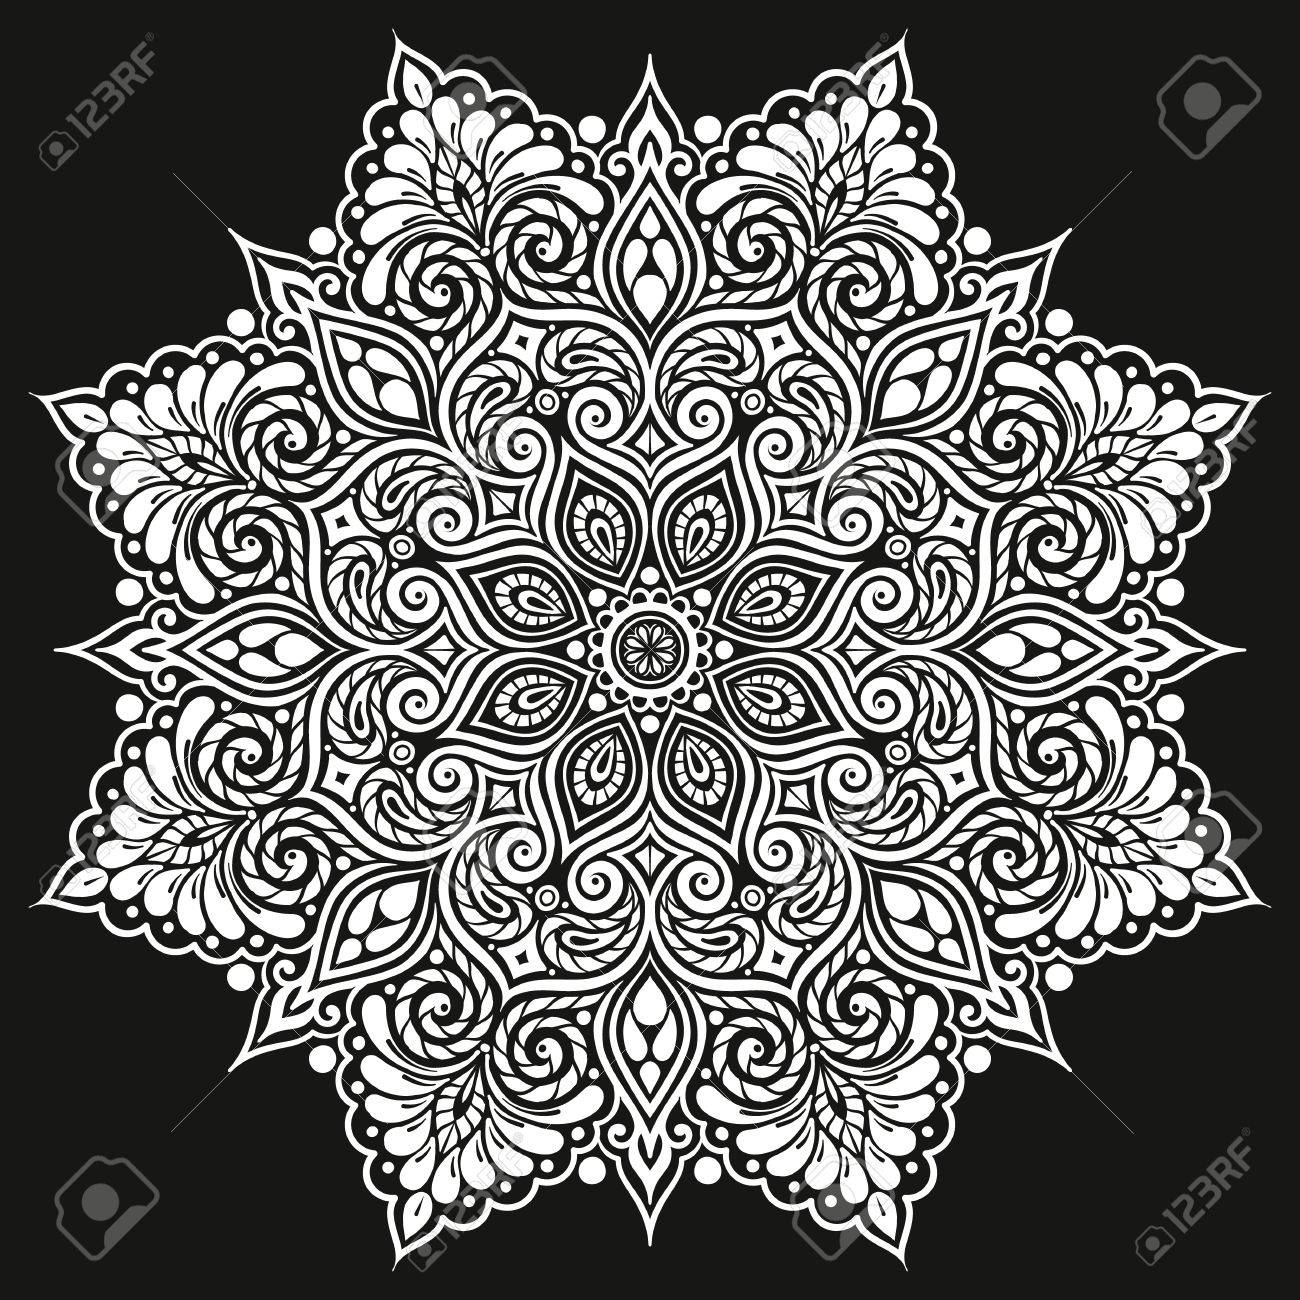 Mandala Vektor Tattoo Perfekte Karte Fur Irgendeine Art Entwurf